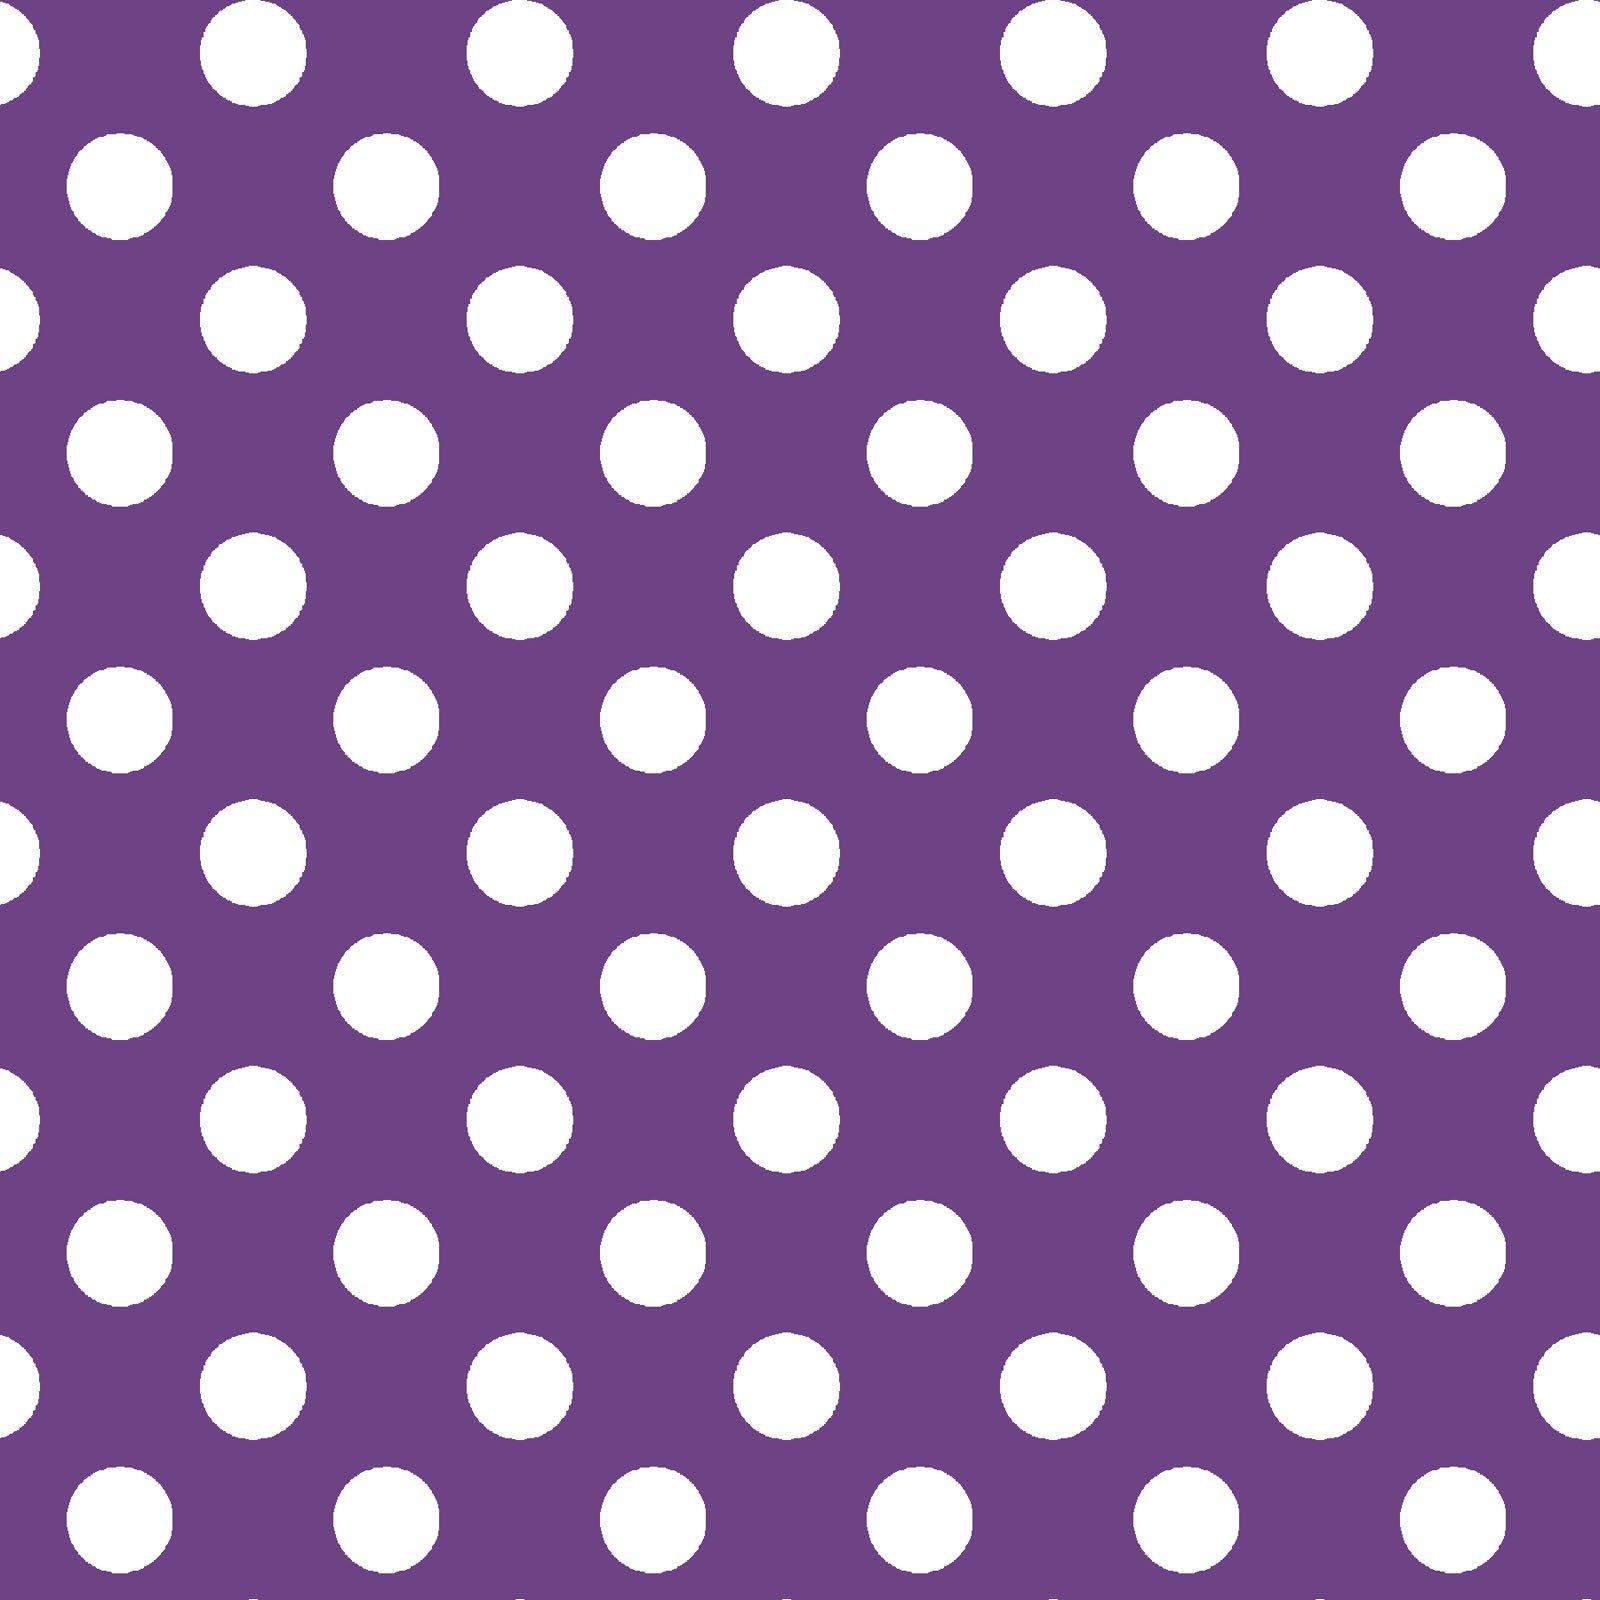 Broomhilda's Bakery - Dots - Purple/White